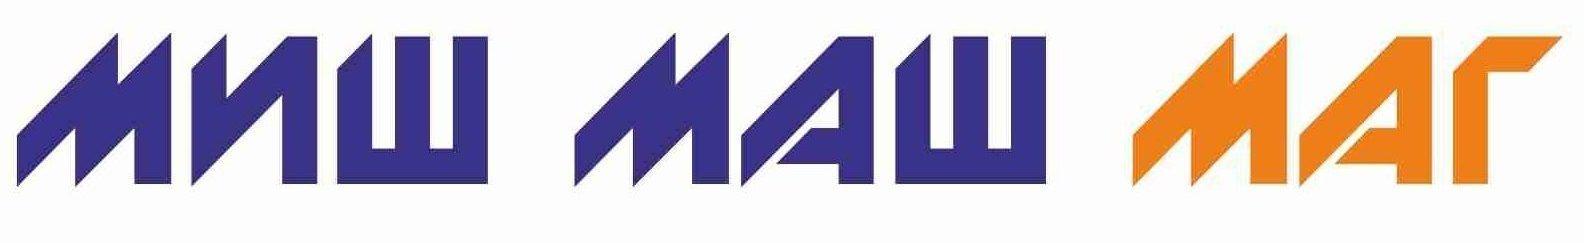 mish-mash-mag.com